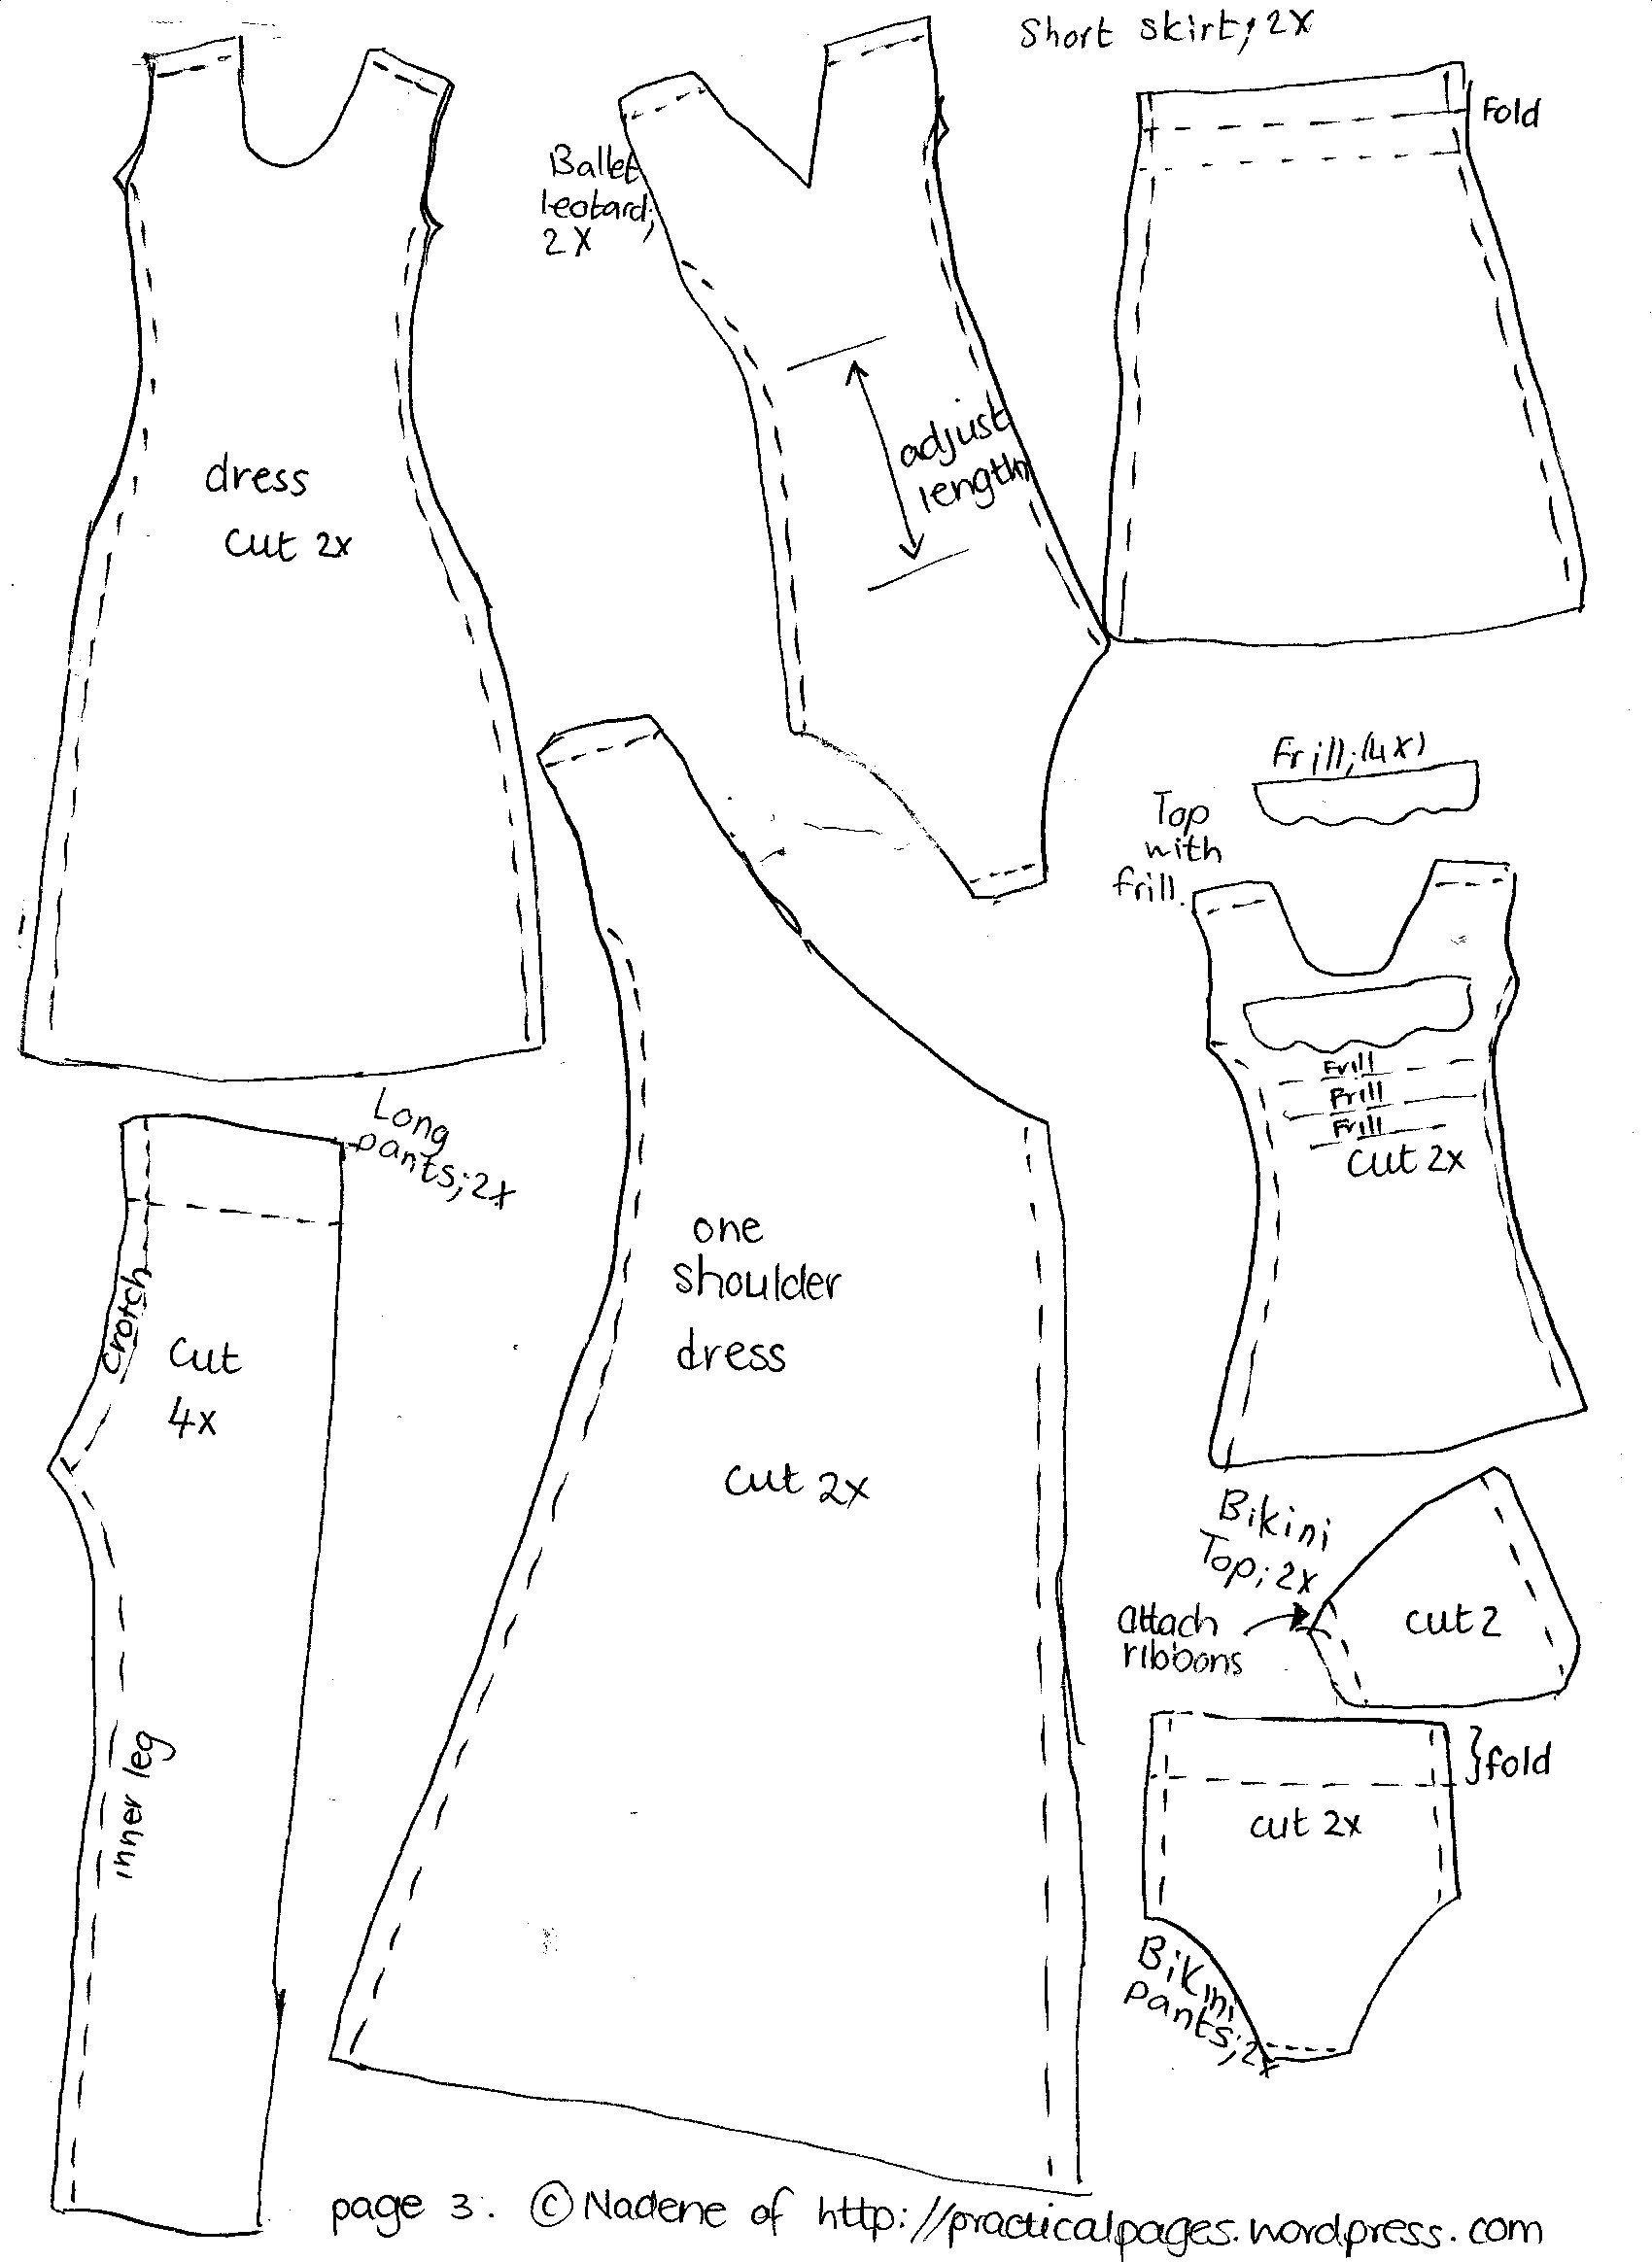 Make A Rag Doll Family | Vicki | Barbie Sewing Patterns, Barbie - Barbie Dress Patterns Free Printable Pdf